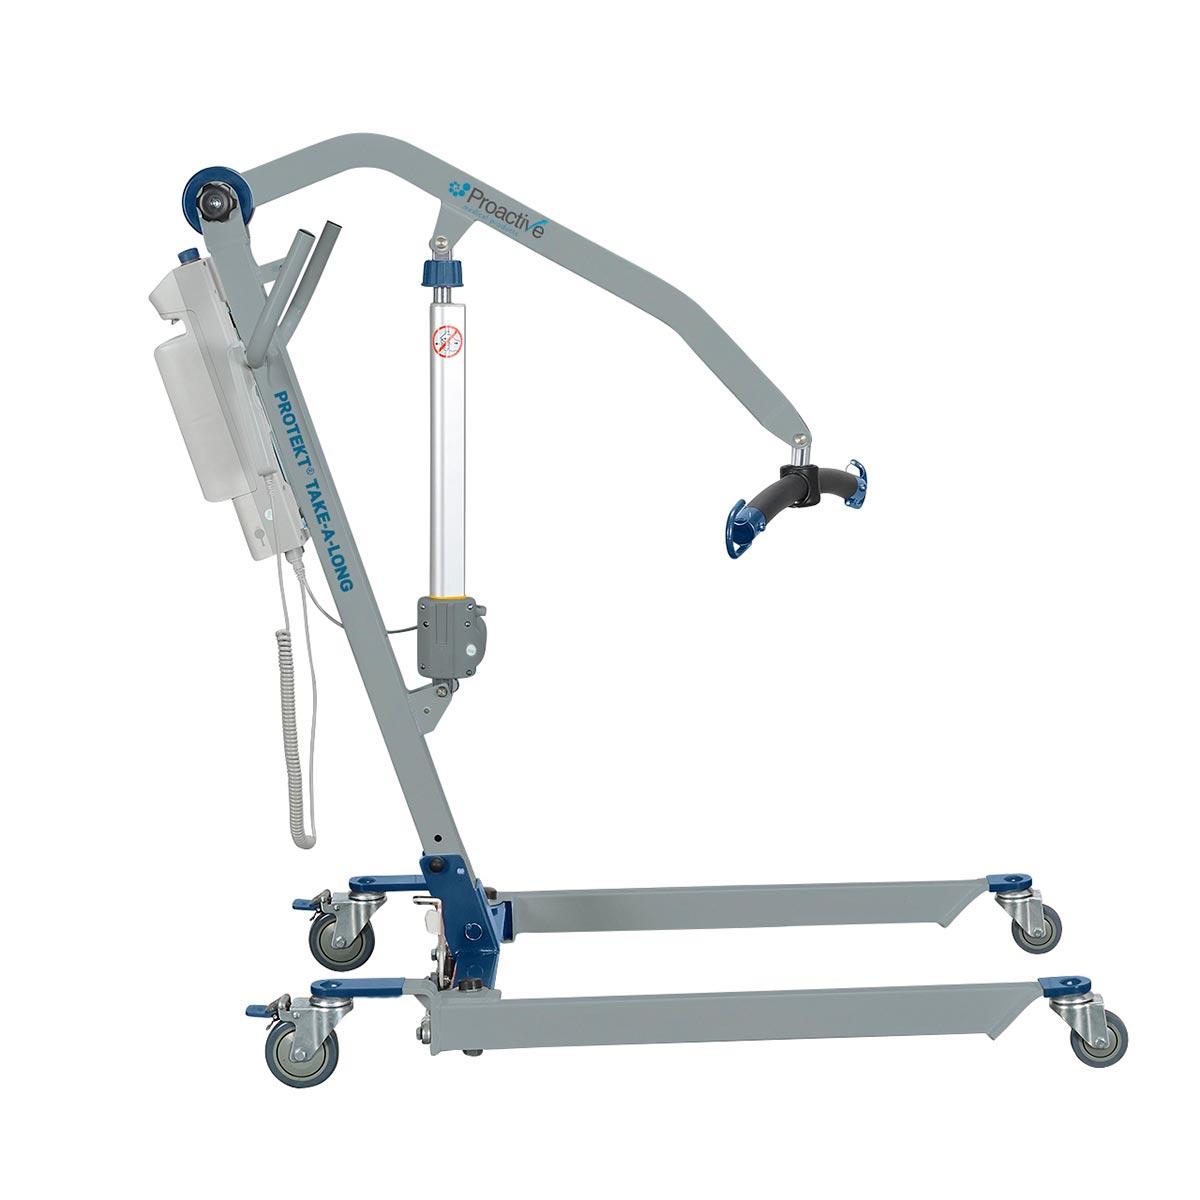 Protekt Full Body Portable Electric Lift